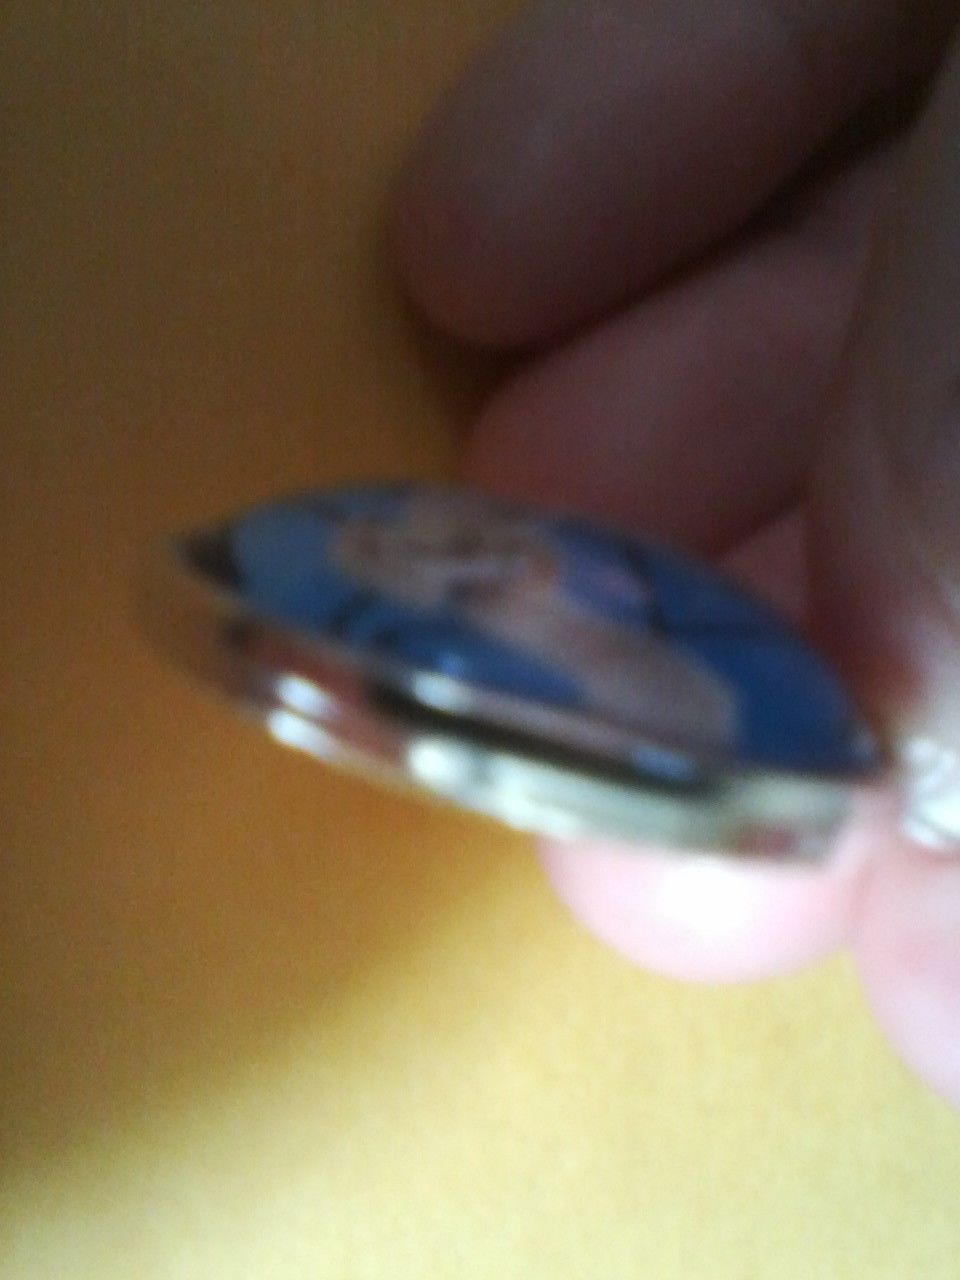 Handmade Elizabeth Name Monogram Glass Dome Necklace Pendant (NPD1420) image 3